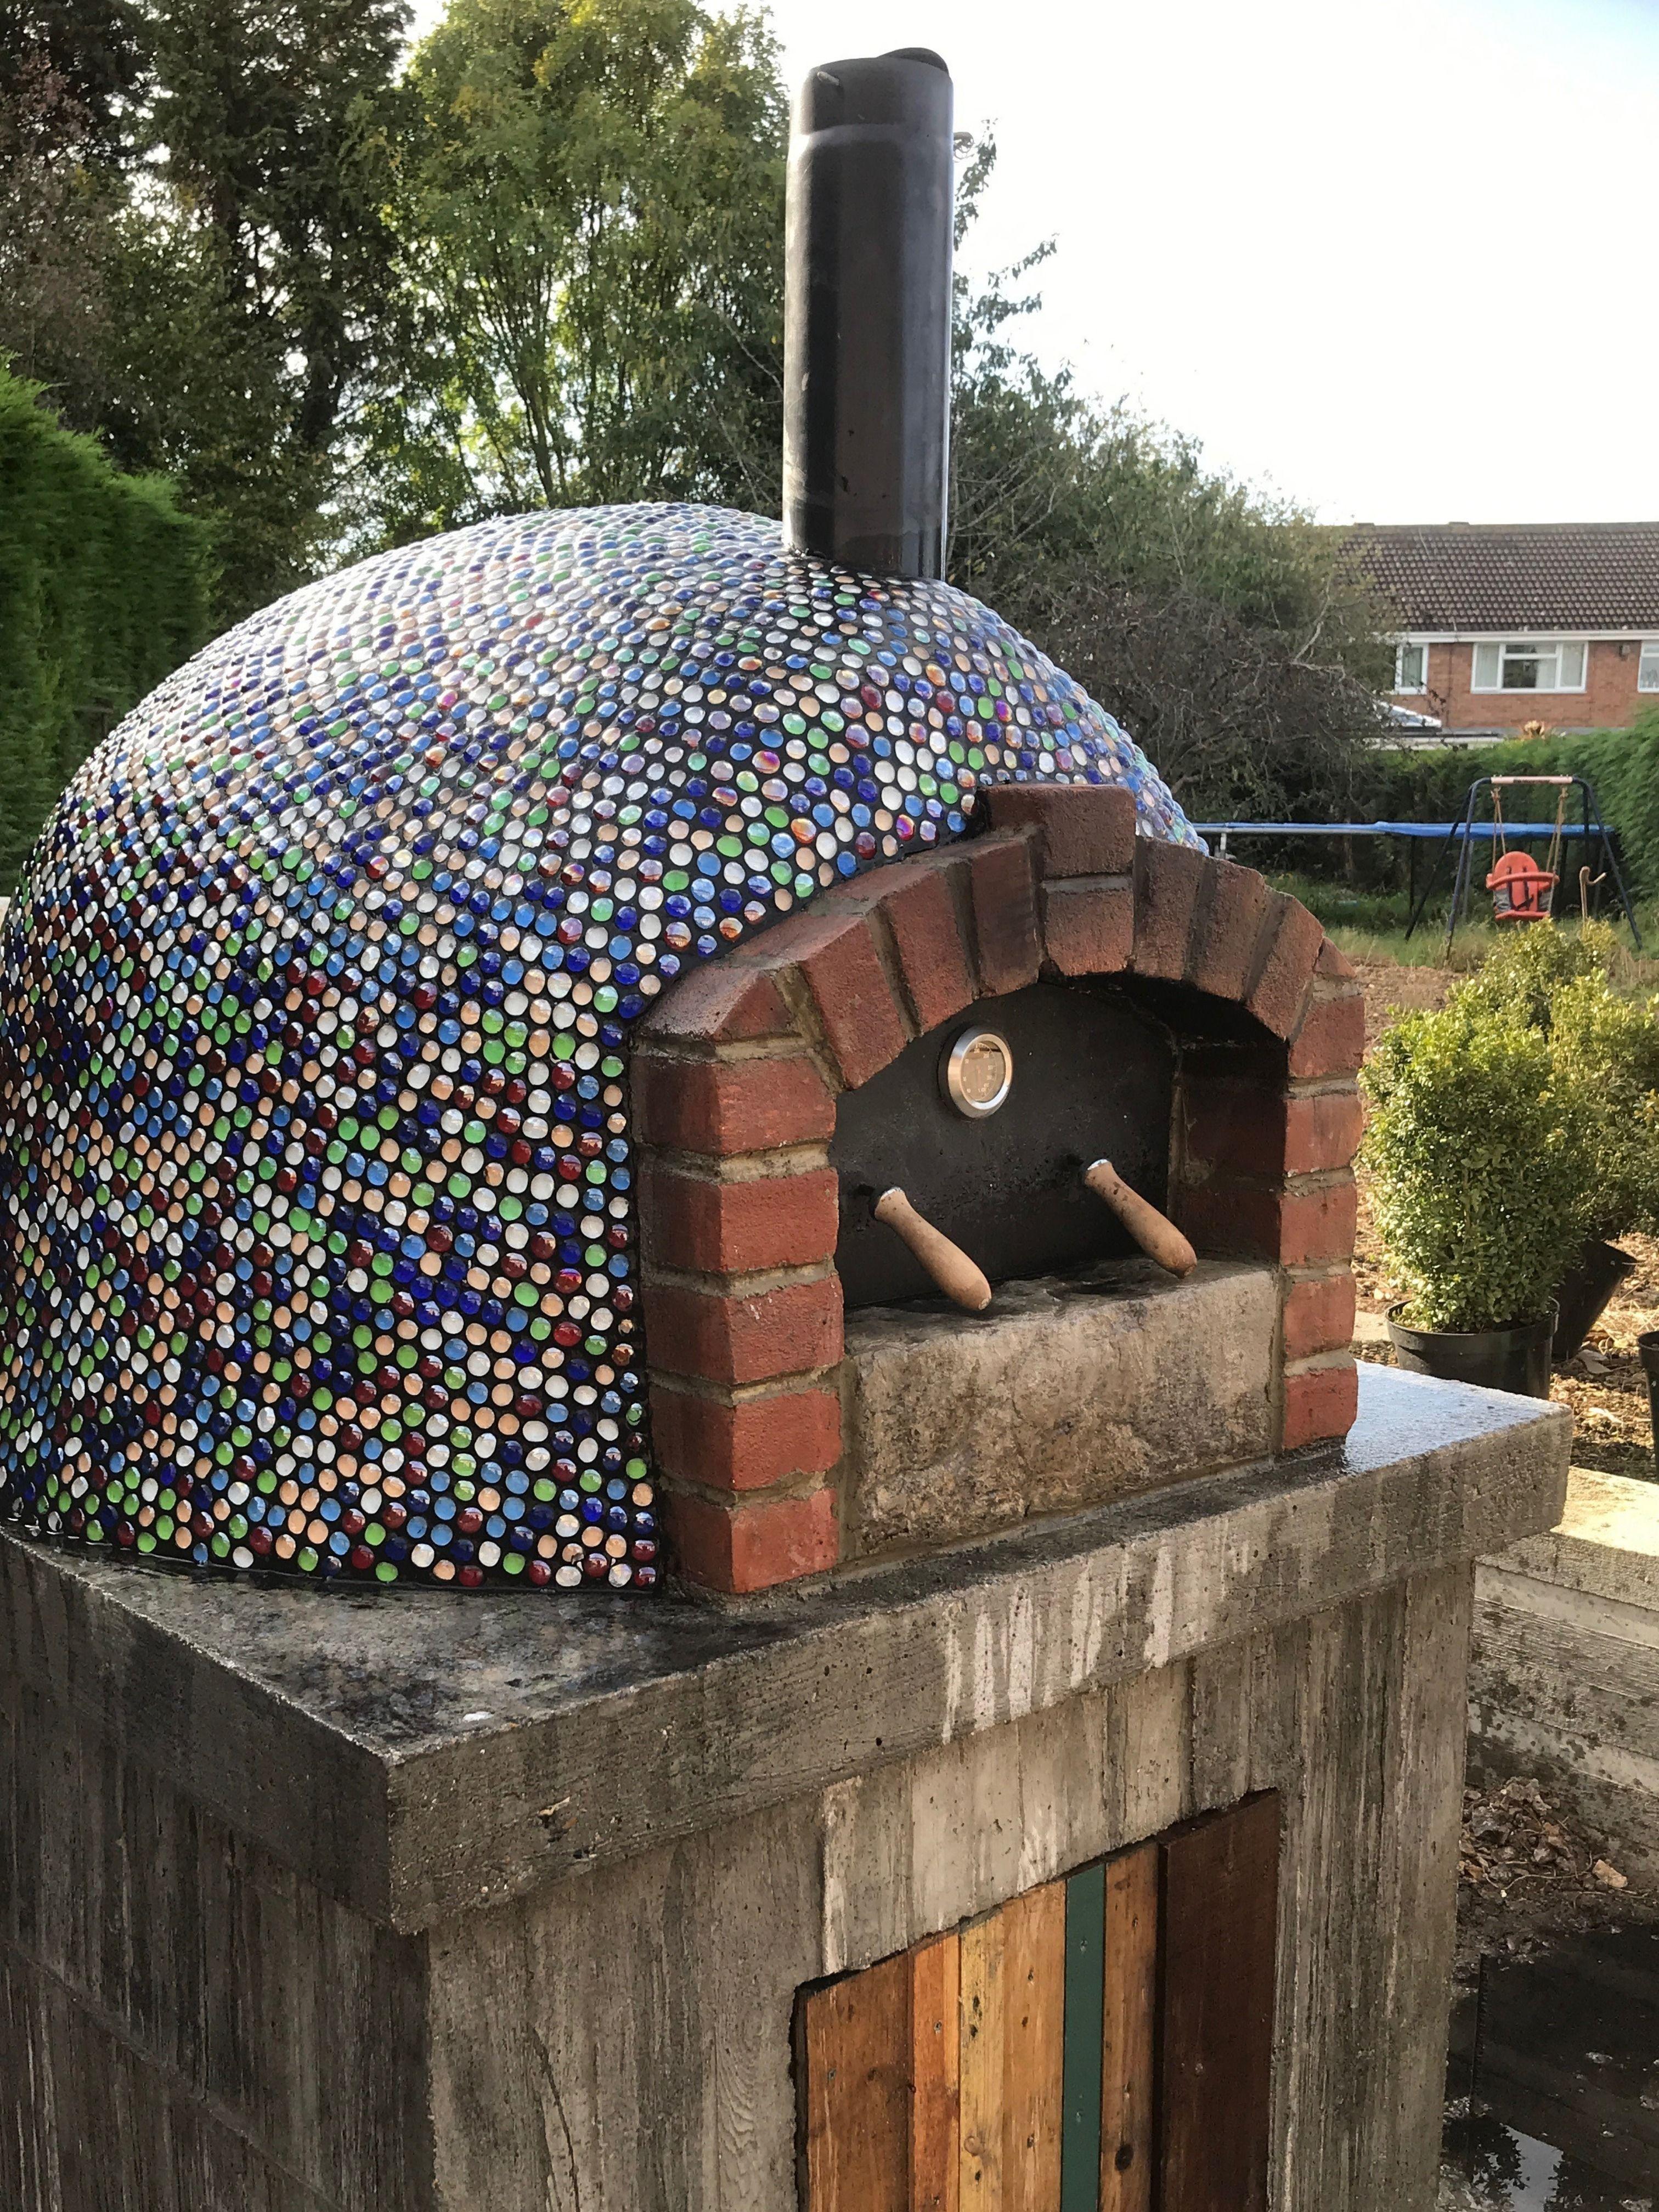 Decorative dome for pizza oven in 2020 pizza oven